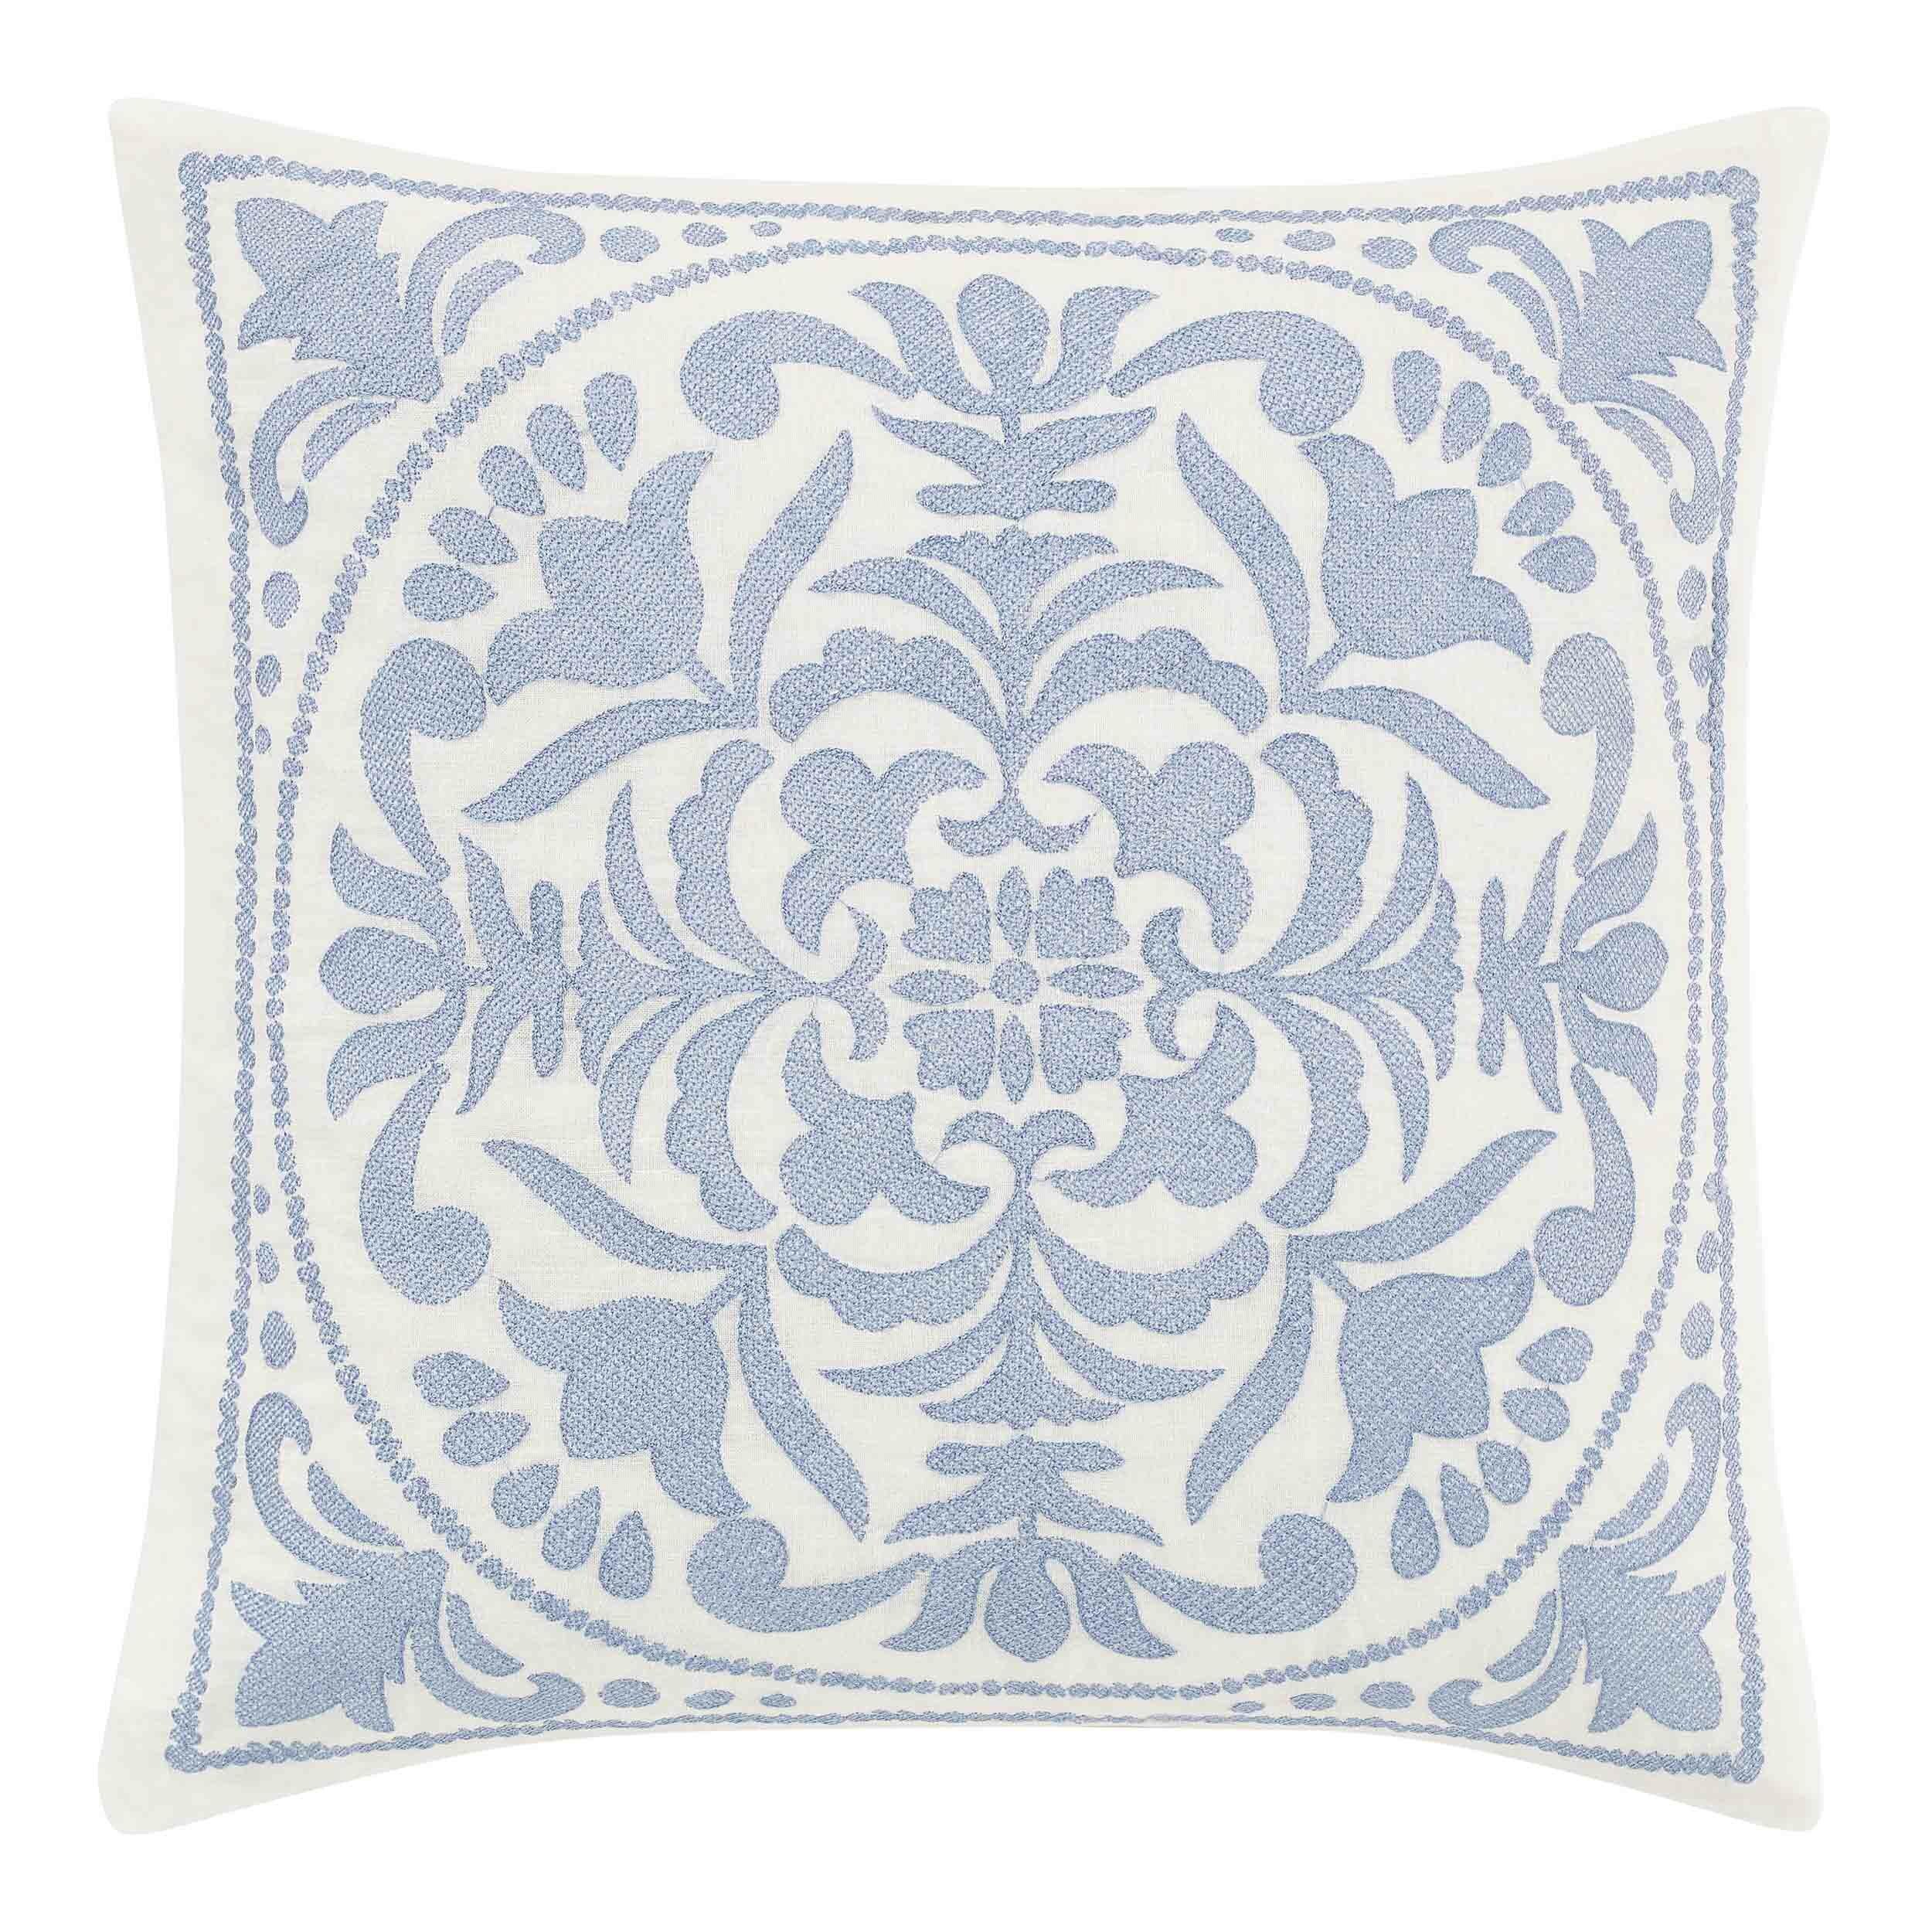 "18/""x18/"" Firm /& Plush Memory Foam Cushion Decorative Throw Pillow Filled"